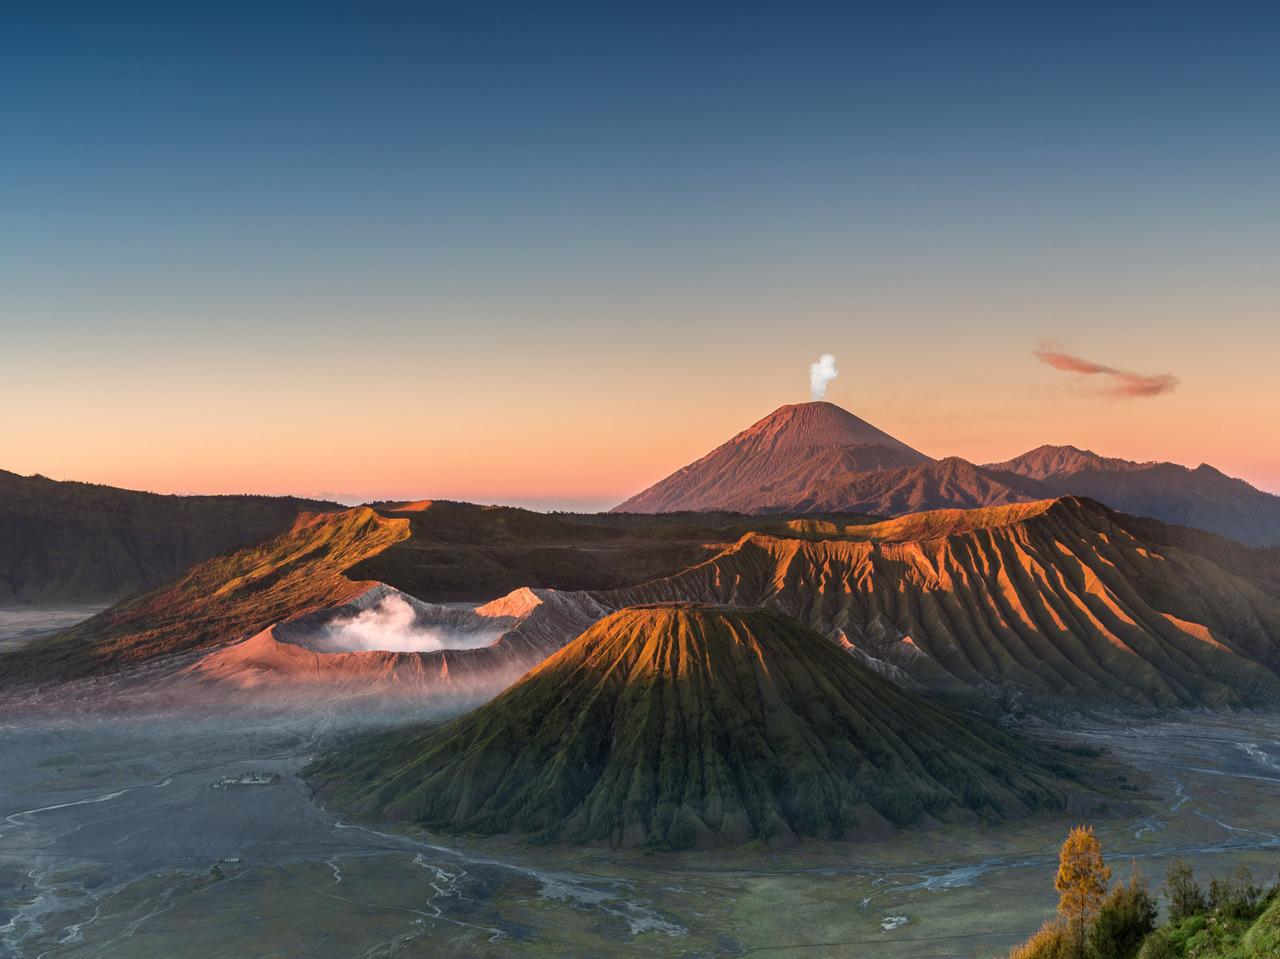 Bromo_Volcano_Indonesia_WEB__49079.1476368276.1280.1280